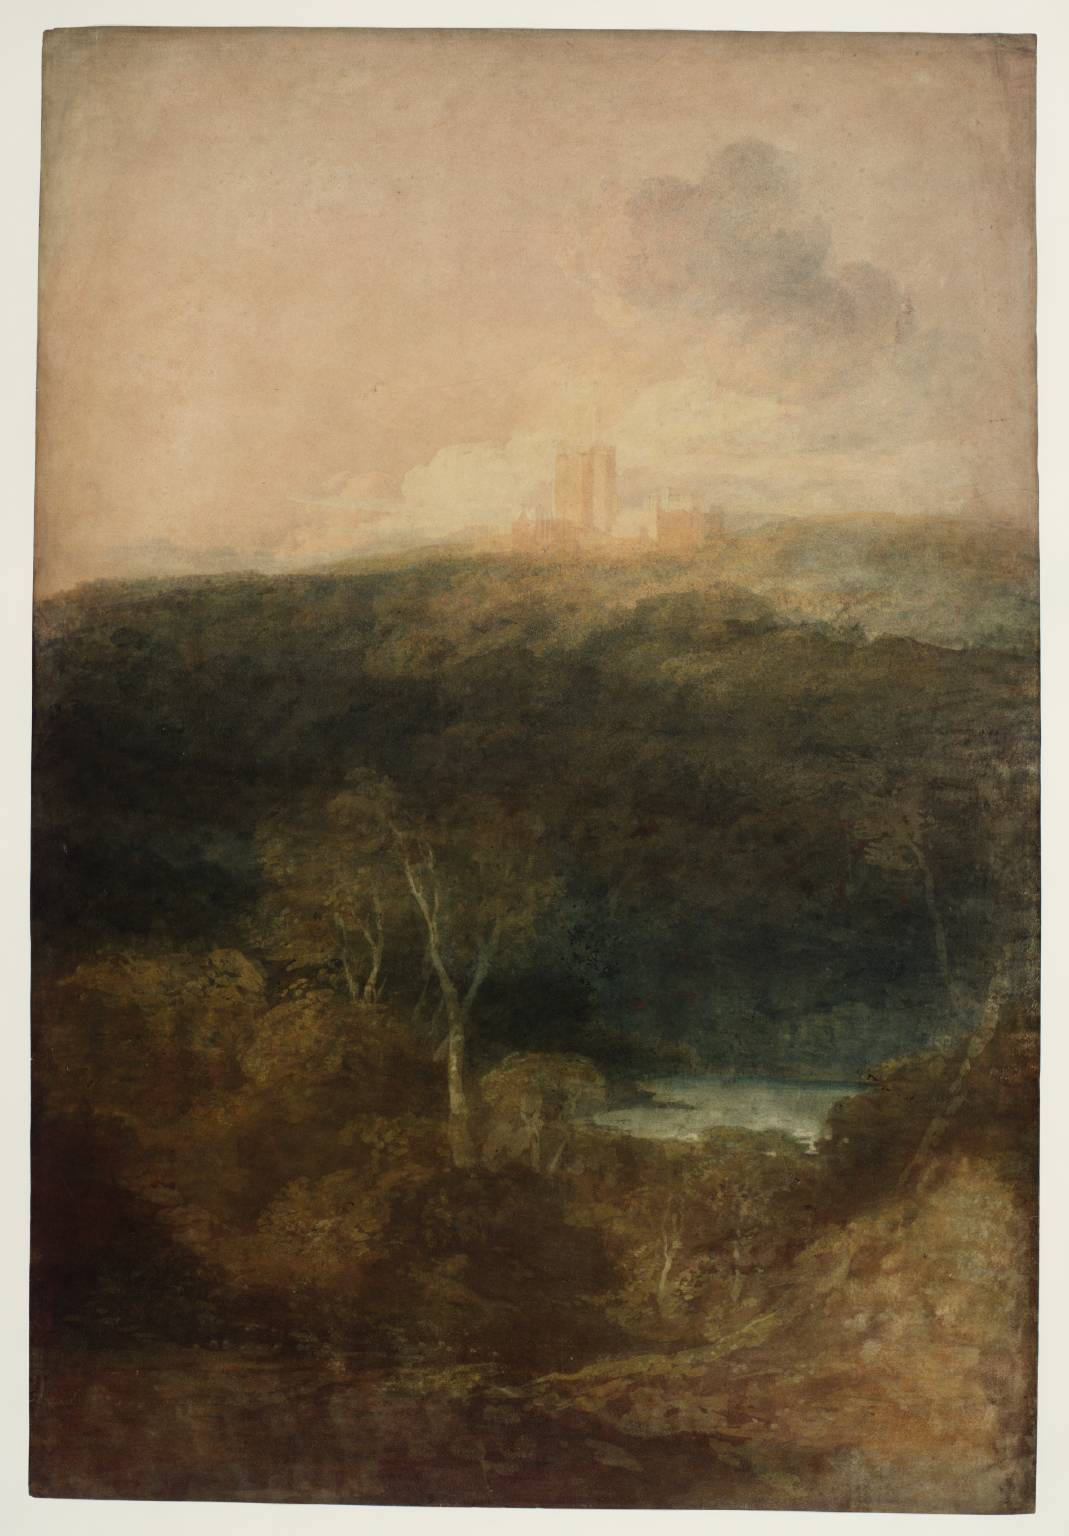 Joseph Mallord William Turner. Views Fonthill Abbey